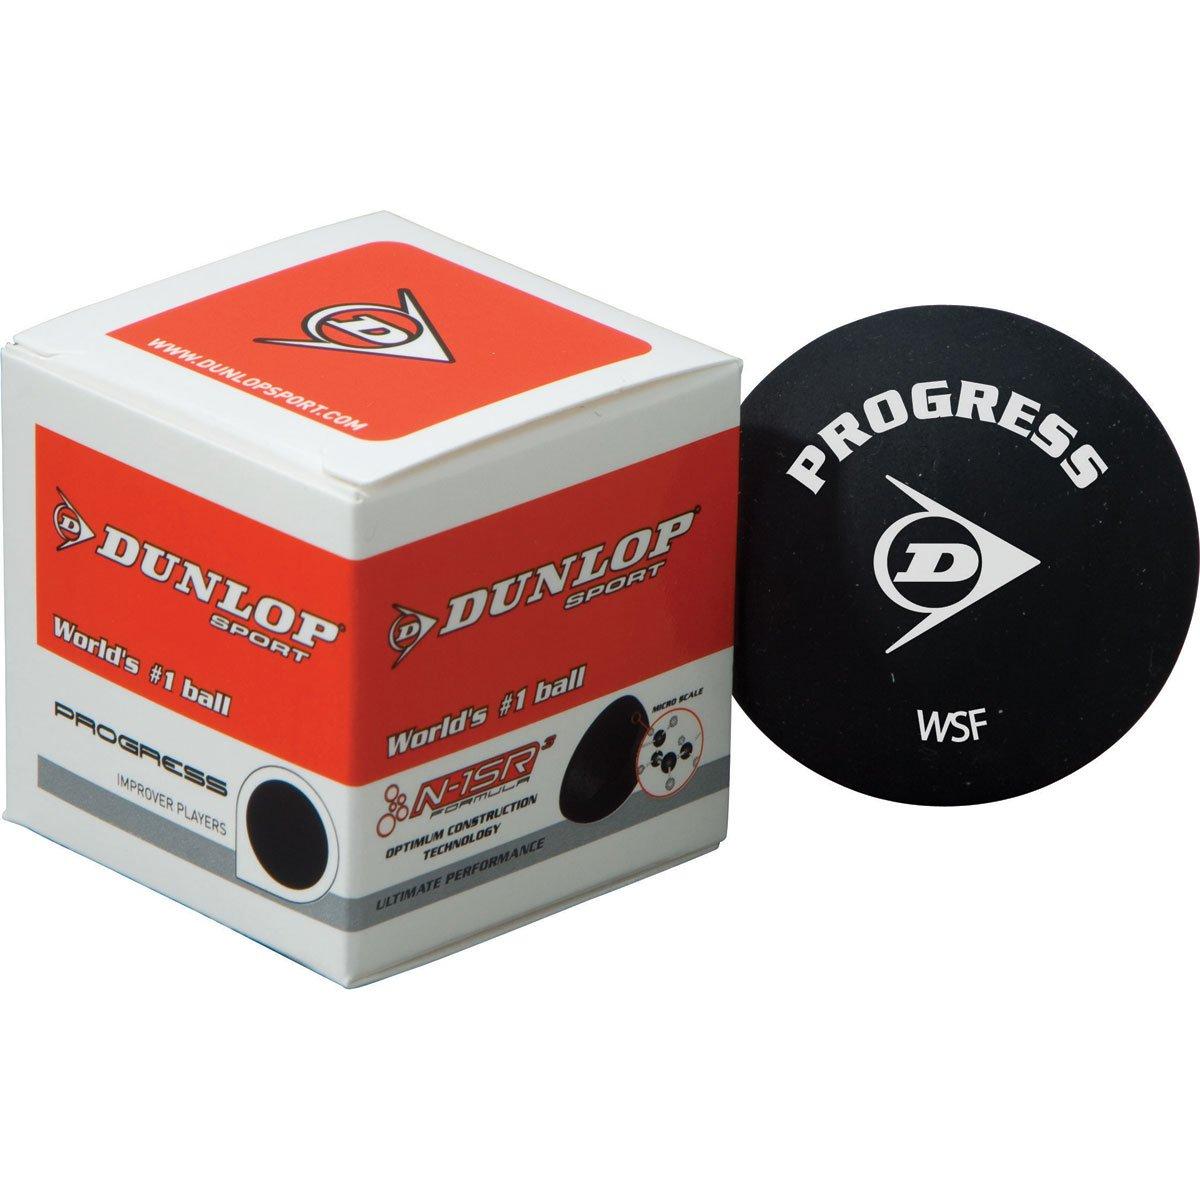 Dunlop Pro Squash Ball (2 X Yellow Dot) by Dunlop